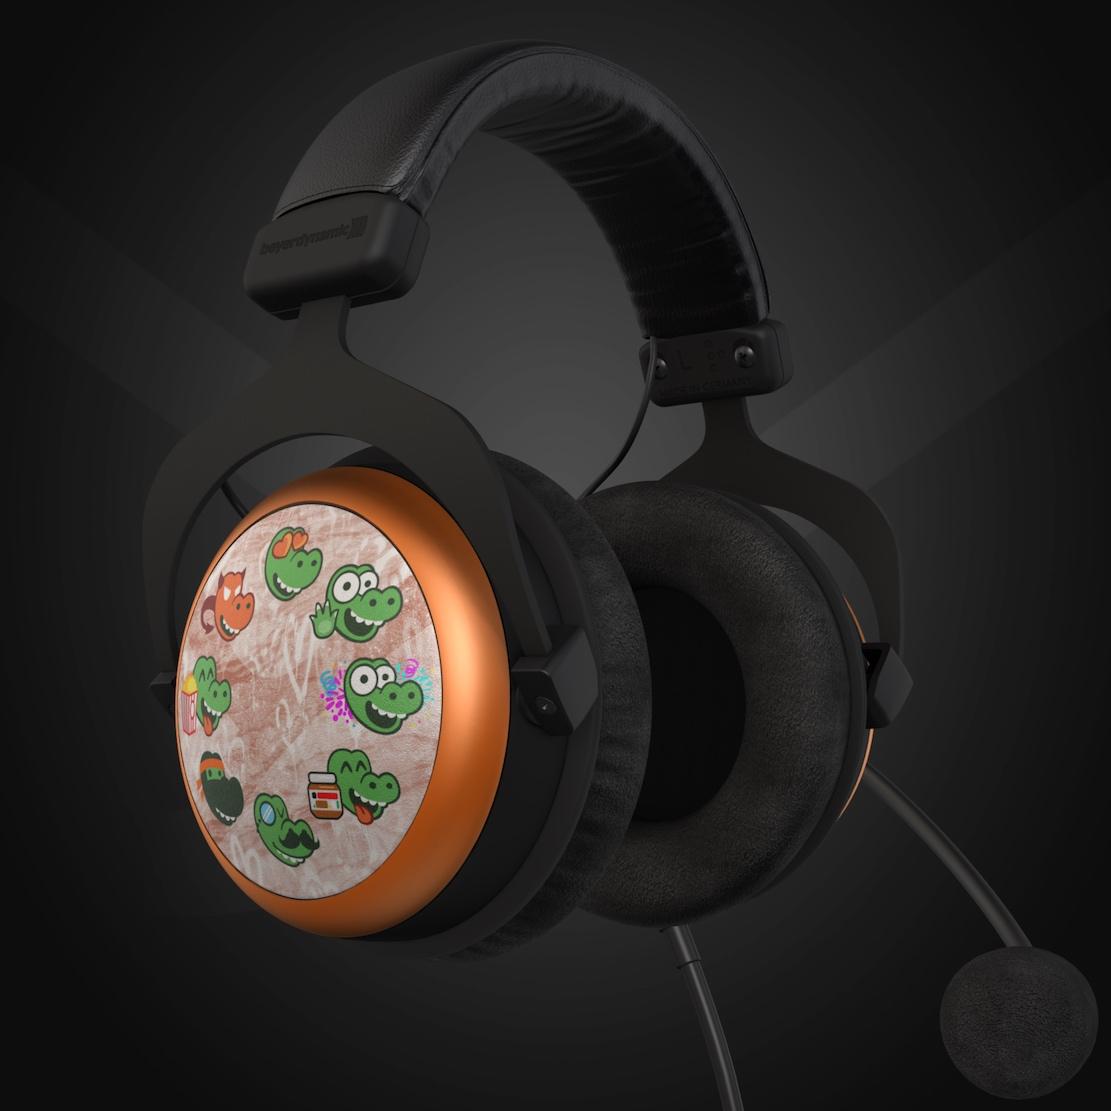 Personalisiertes beyerdynamic MMX300 Gaming-Headset zum Bestpreis!